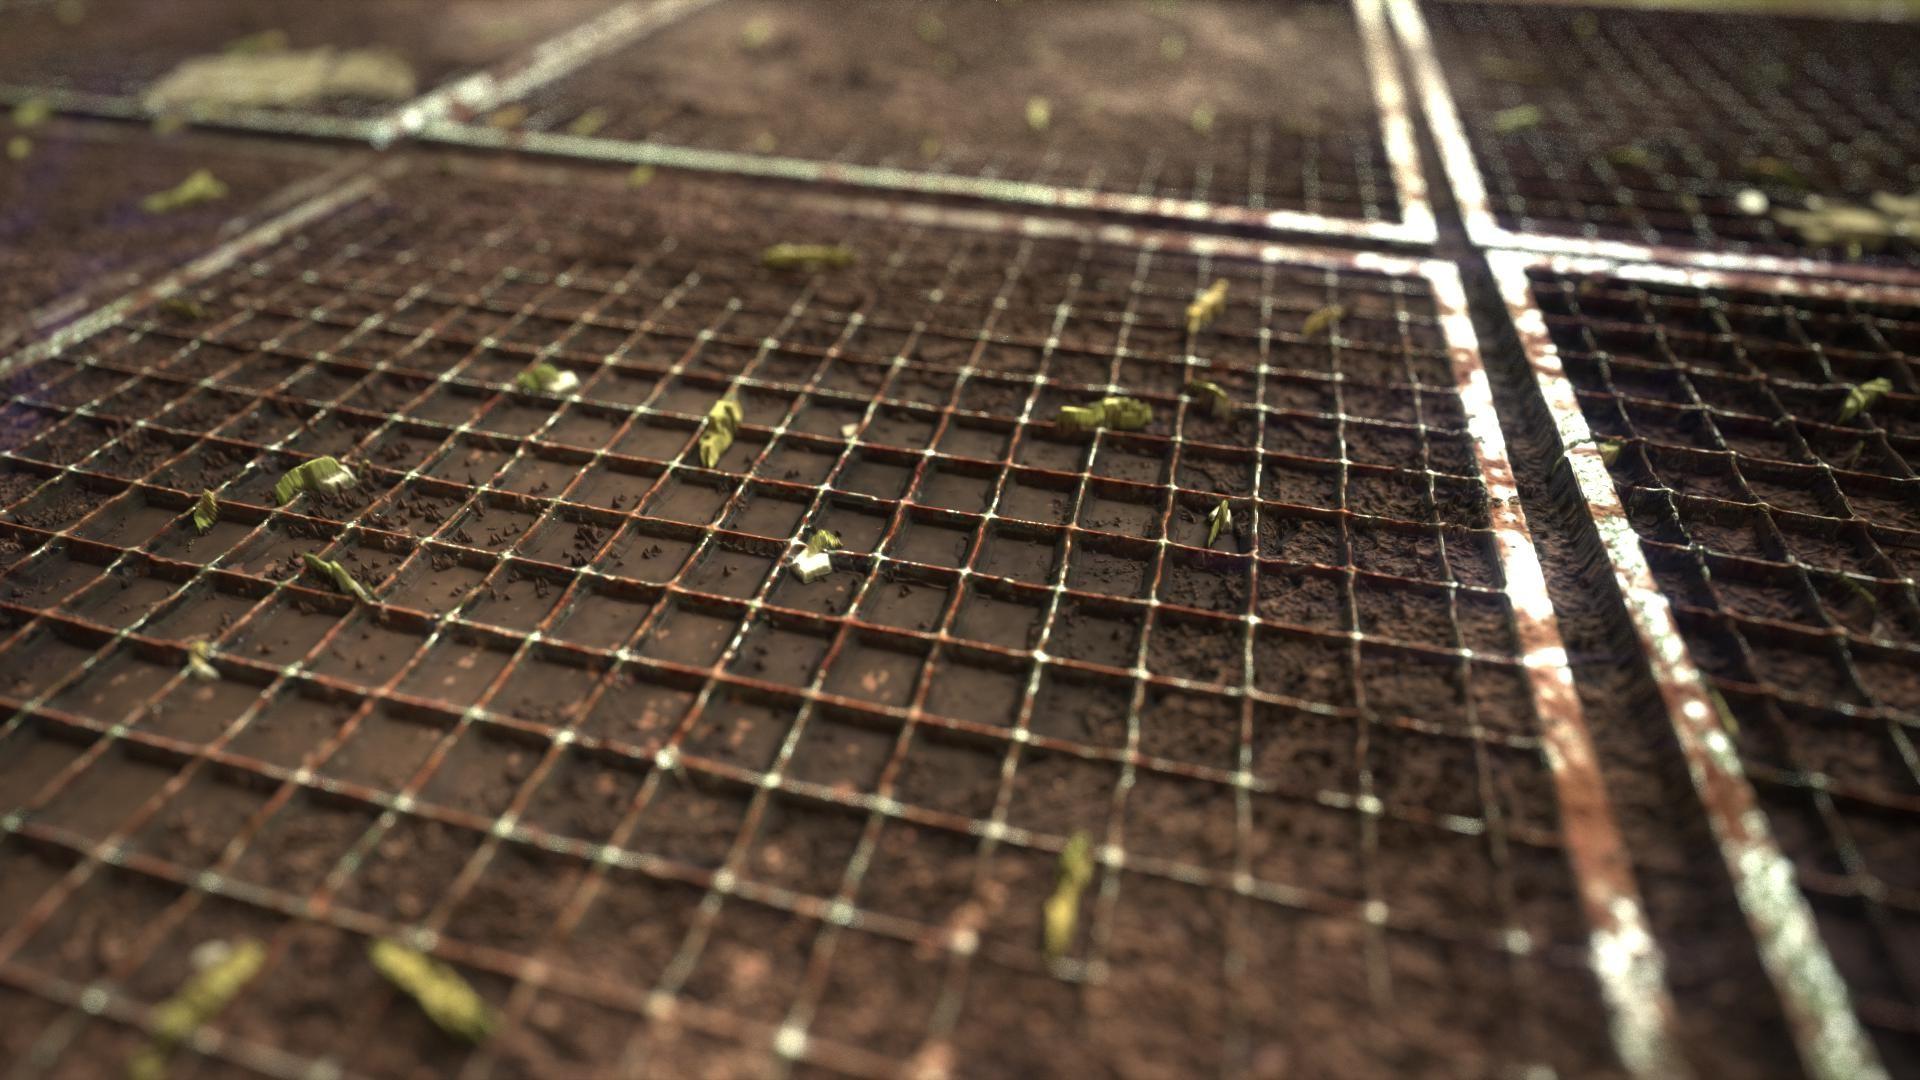 Leonardo iezzi ground texture 01